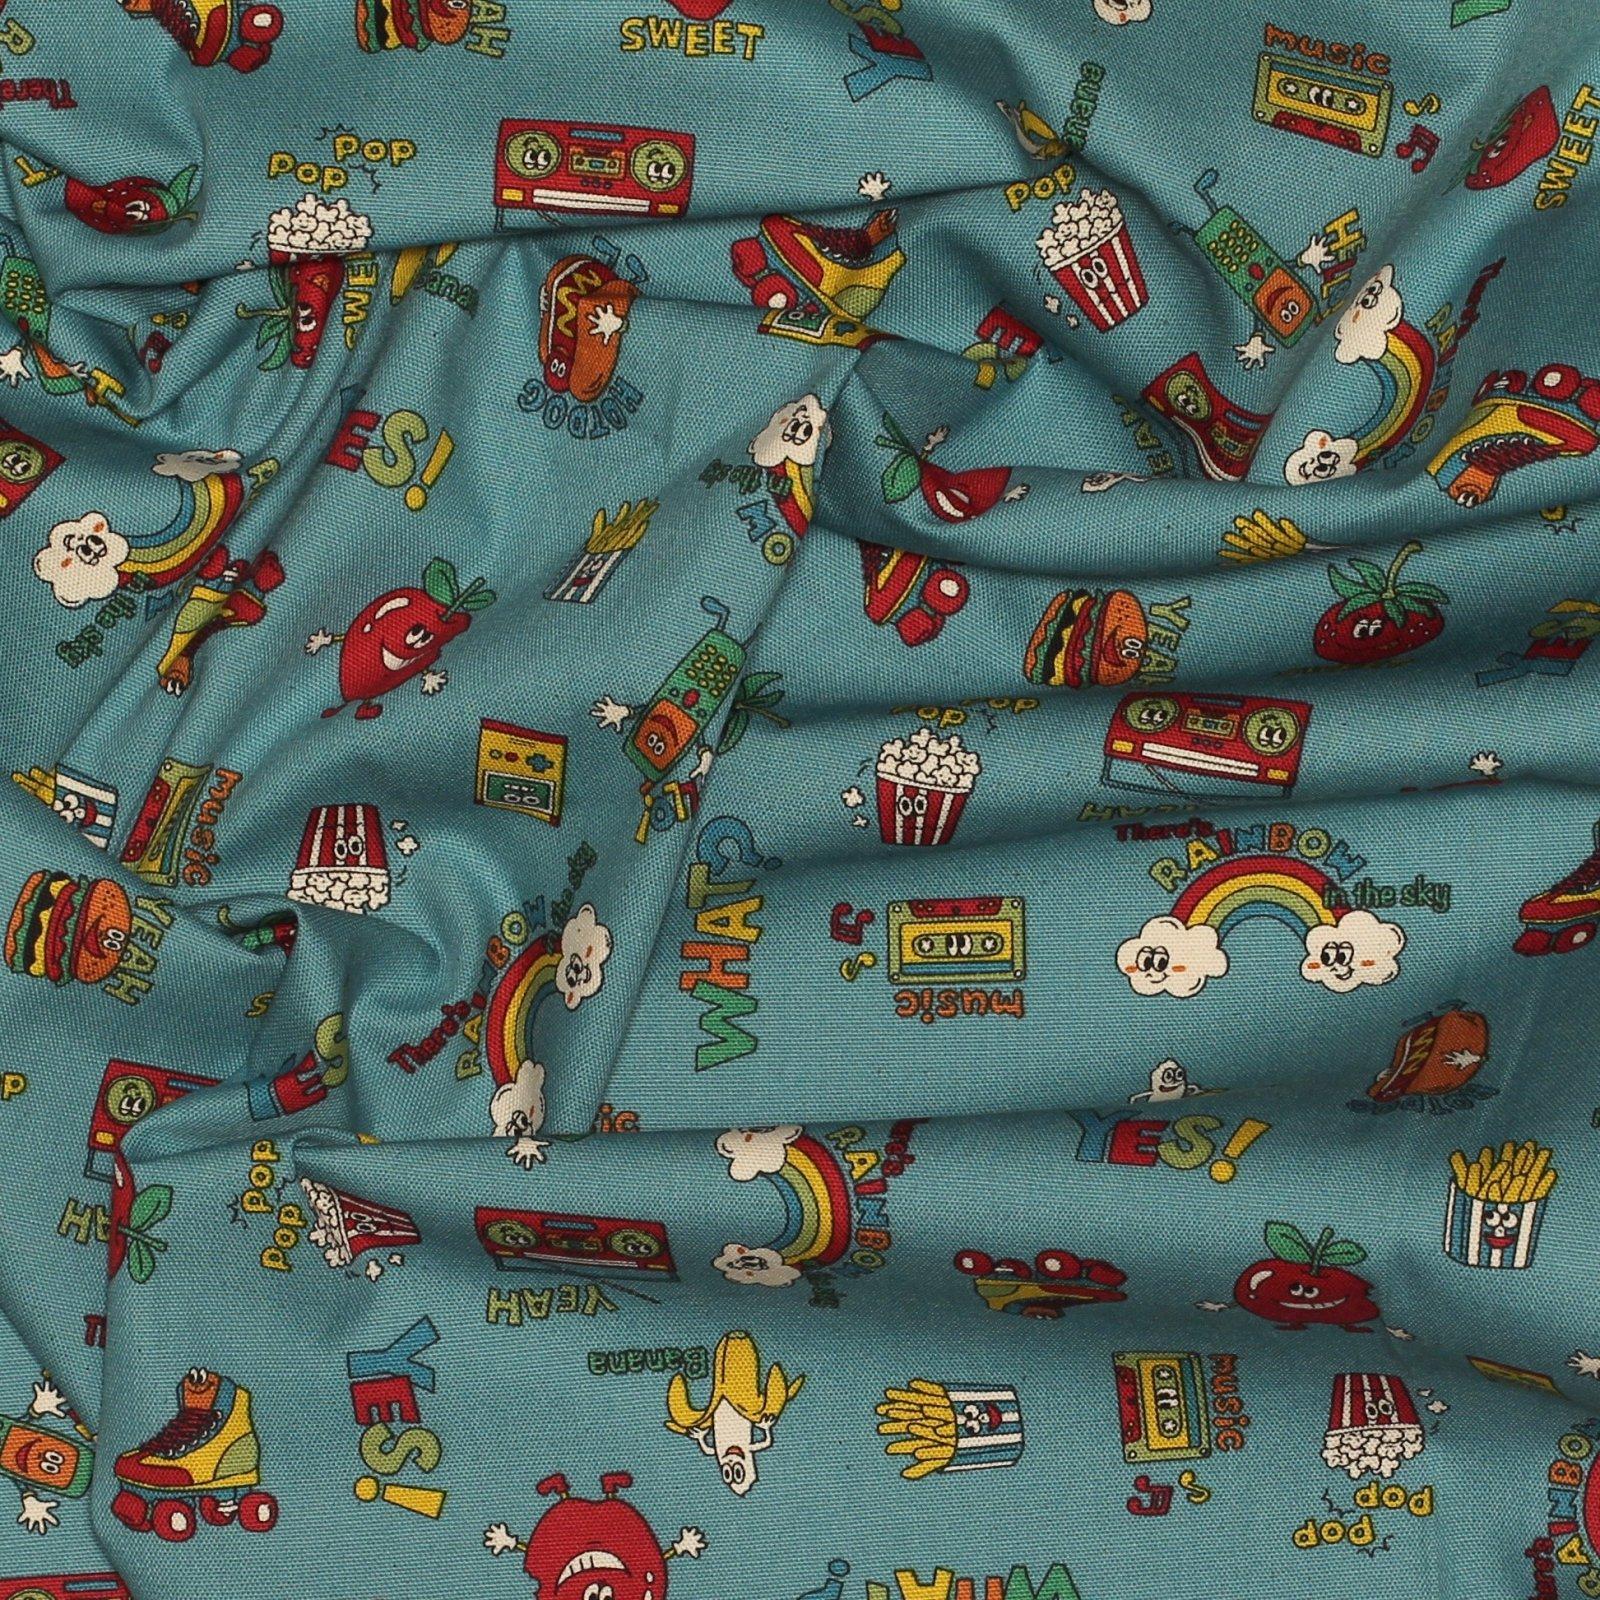 Retro Pop Culture - Kokka - Japanese Cotton